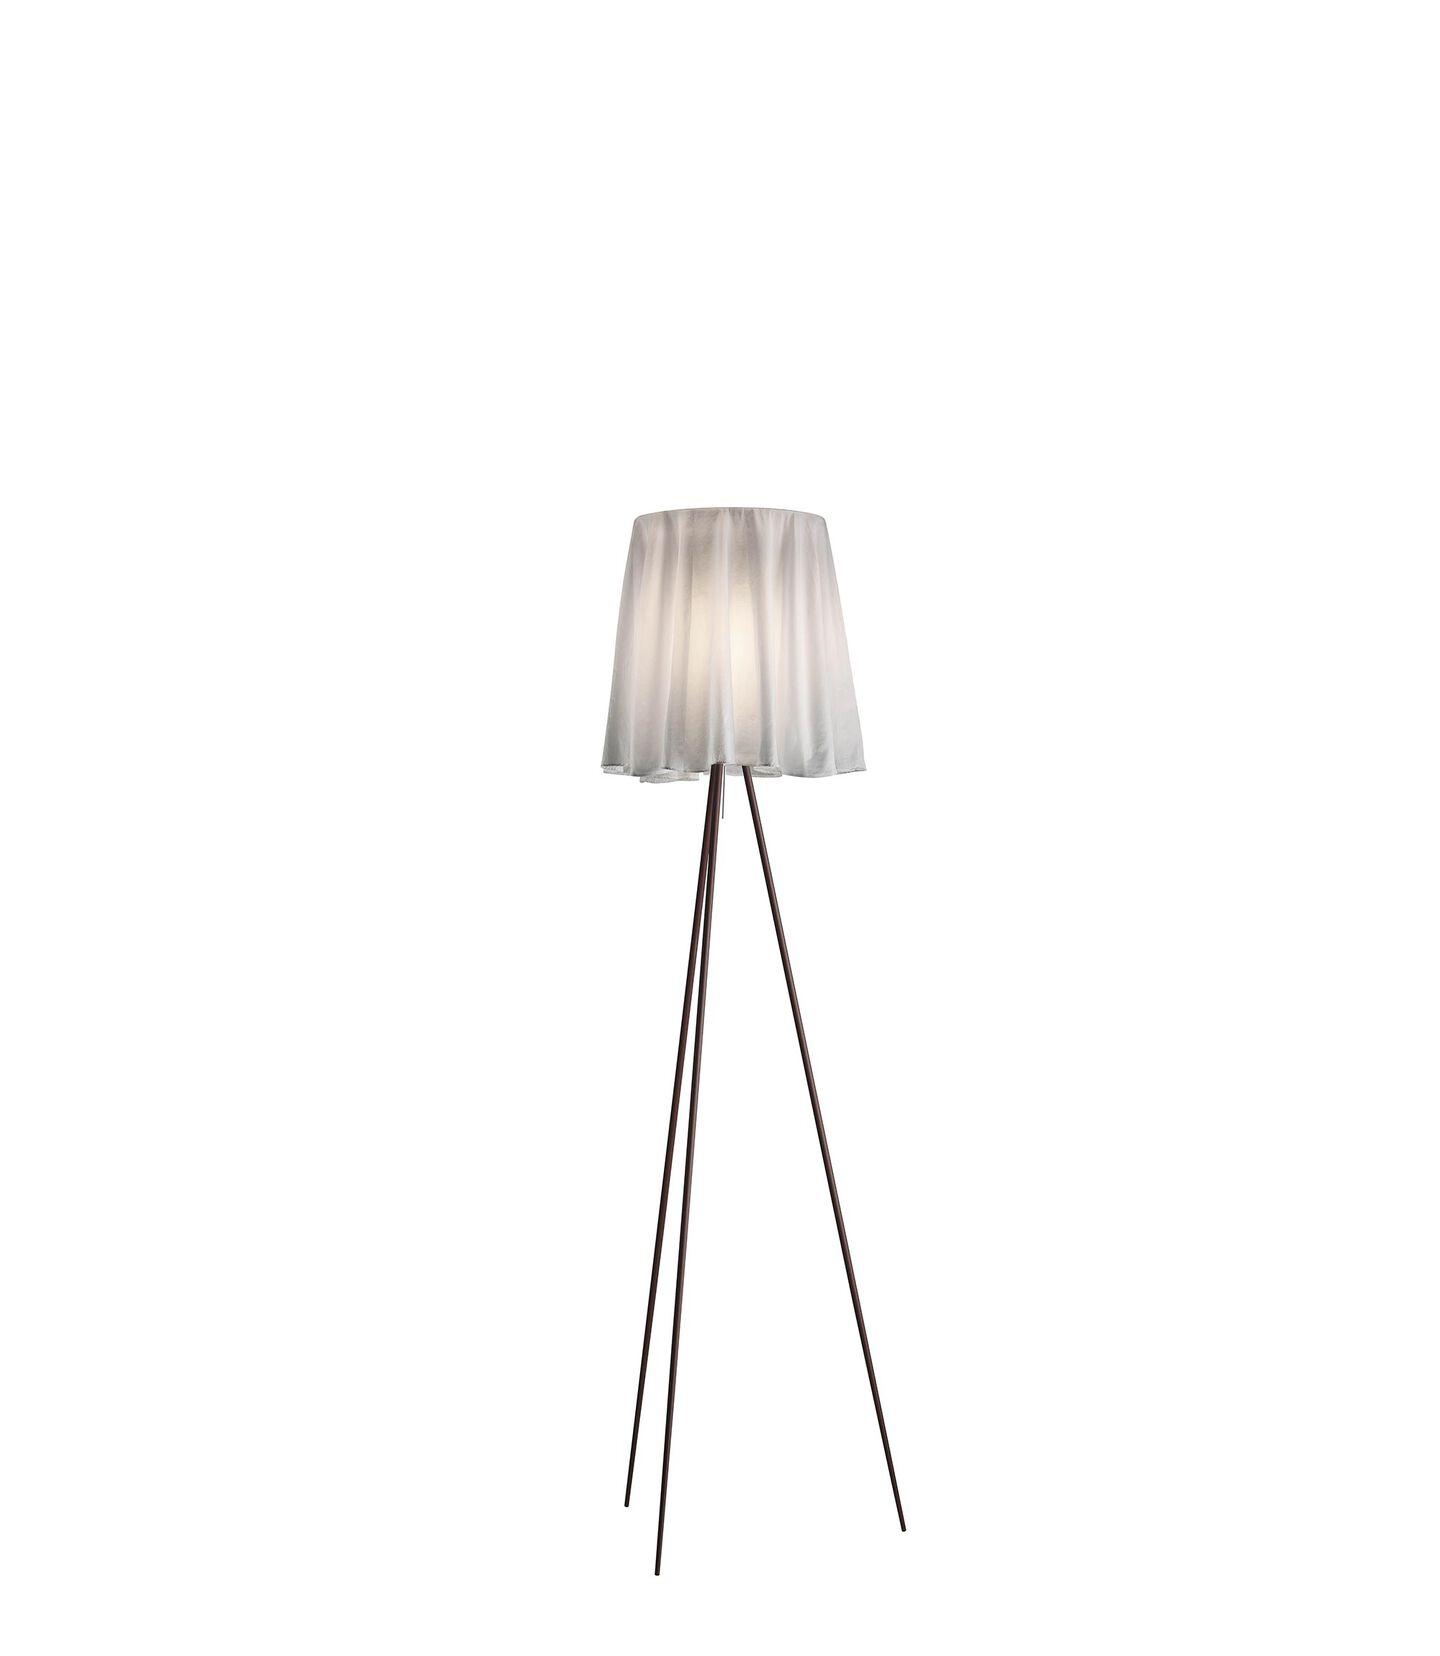 rosi-angelis-floor-starck-flos-F6160020-product-still-life-big-2